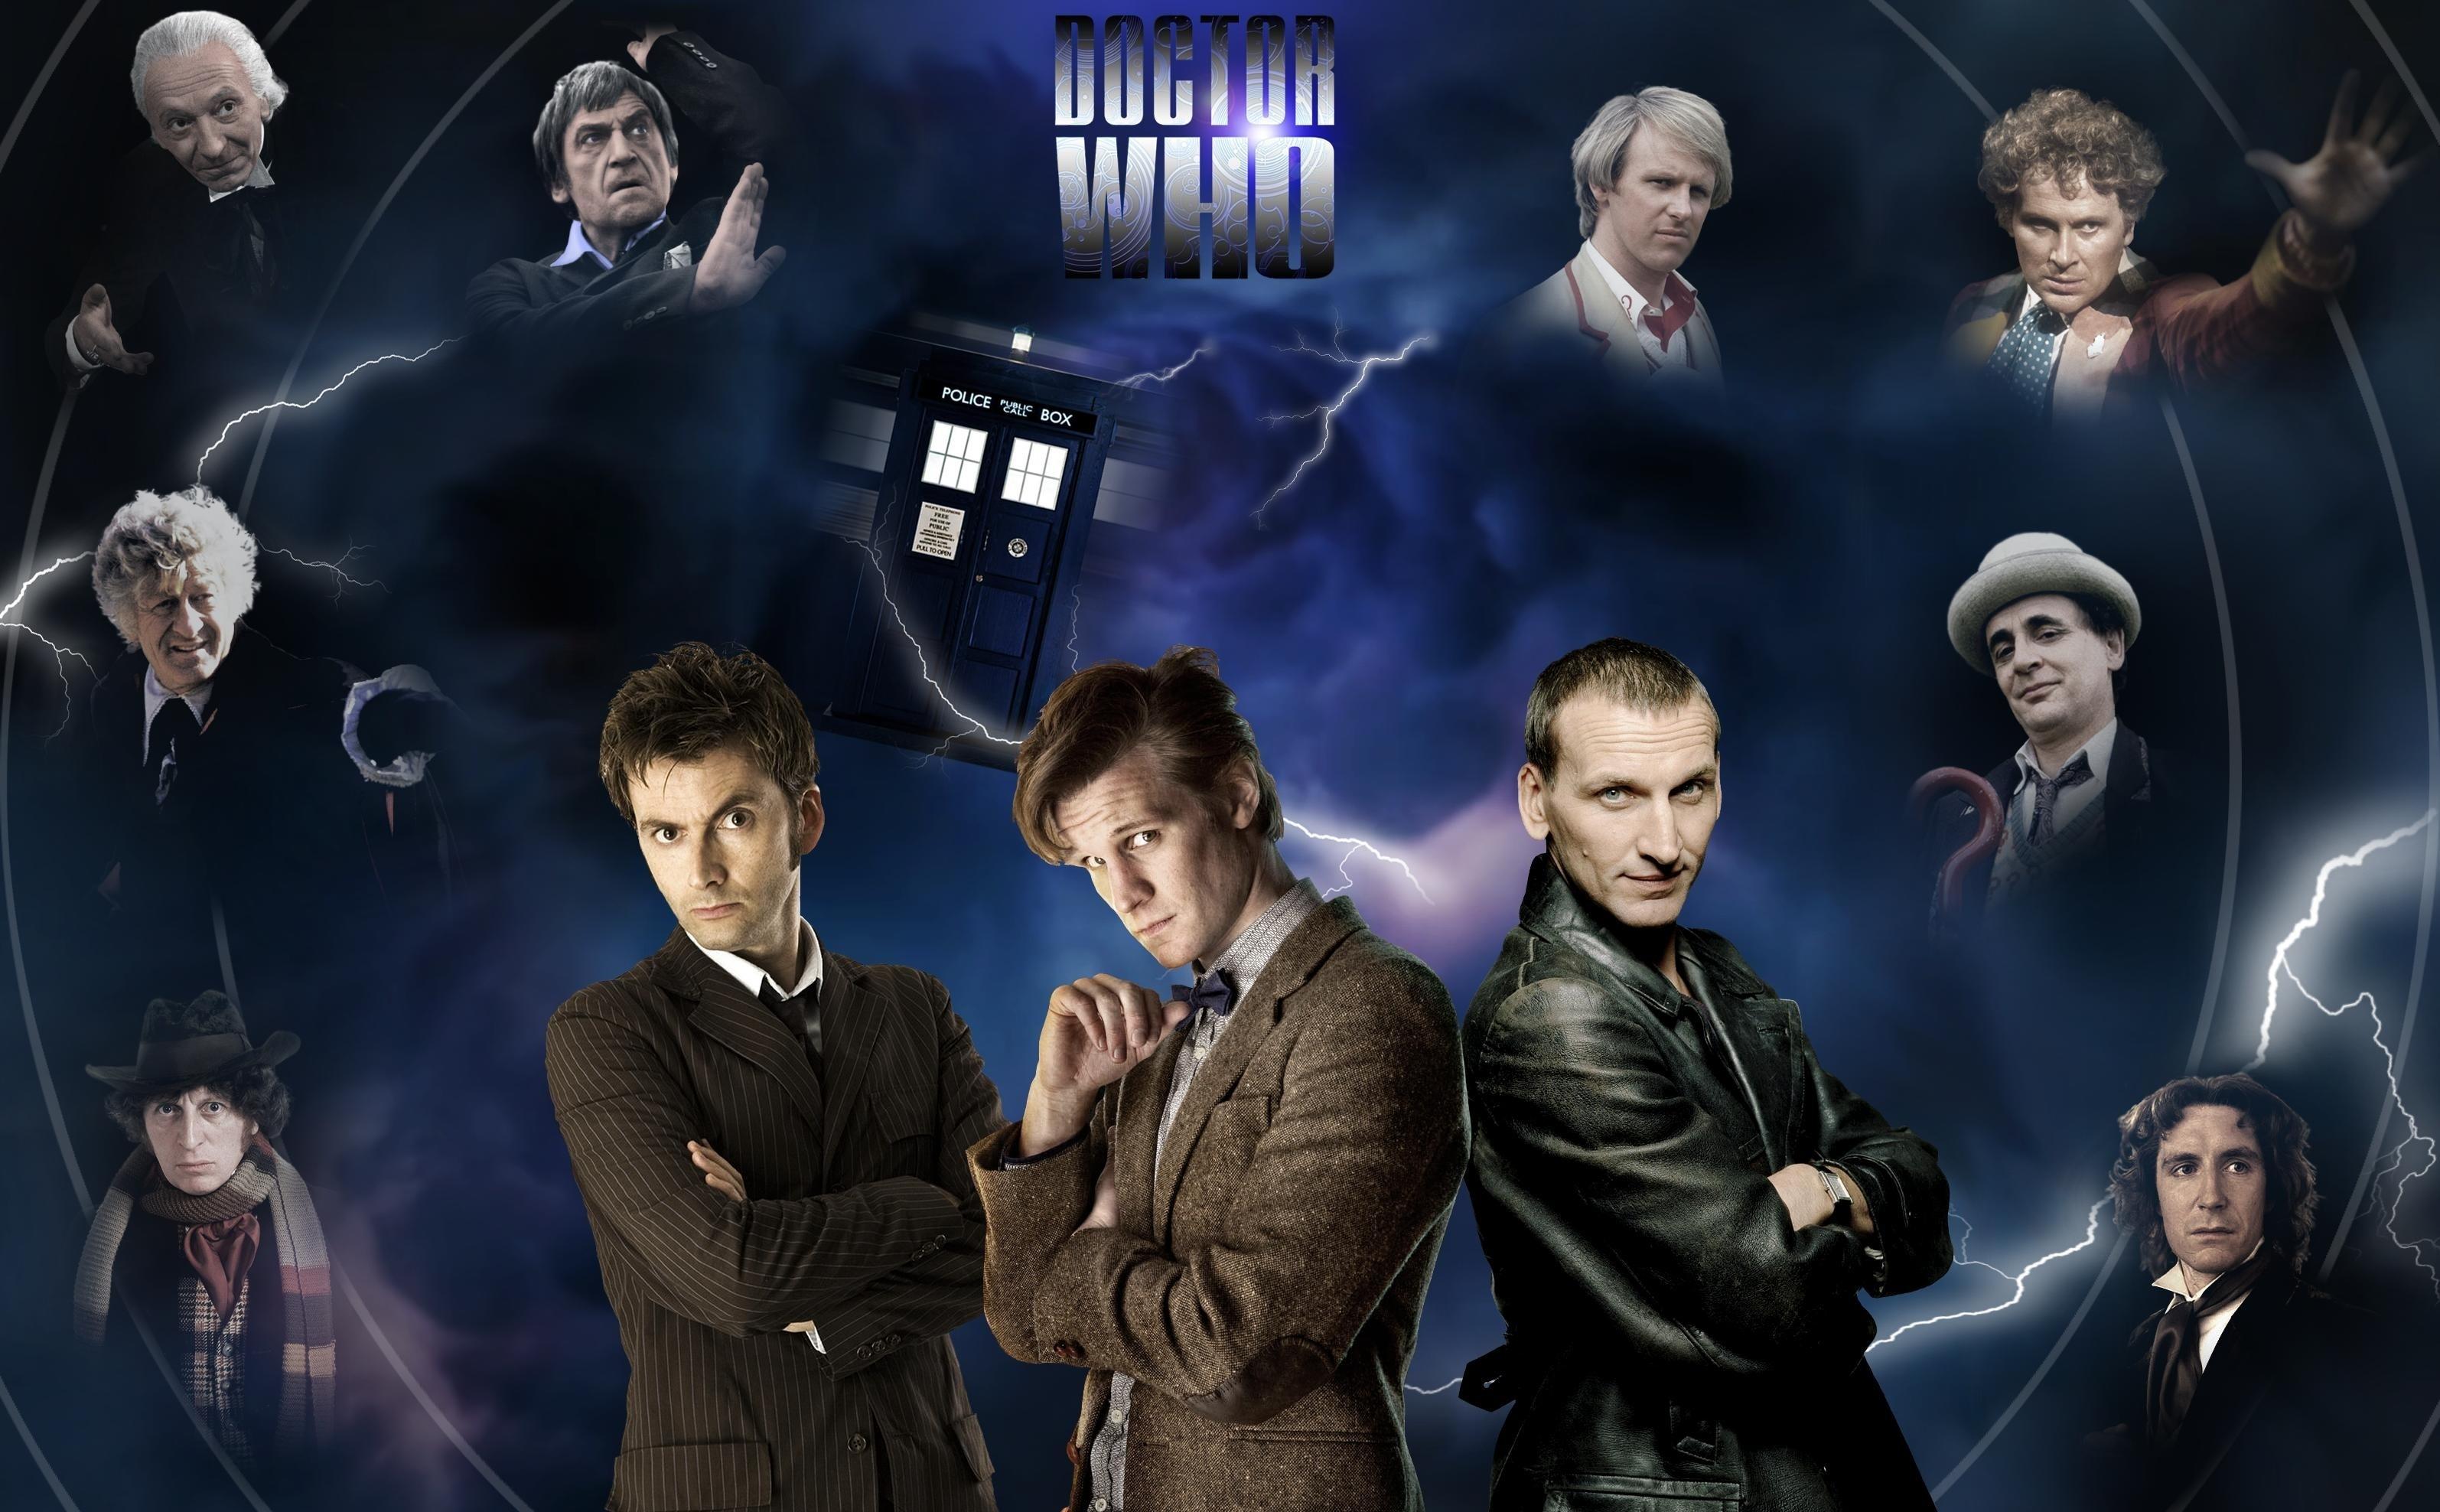 tardis david tennant matt smith fourth doctor tom baker doctors eleventh  doctor paul mcgann doctor w